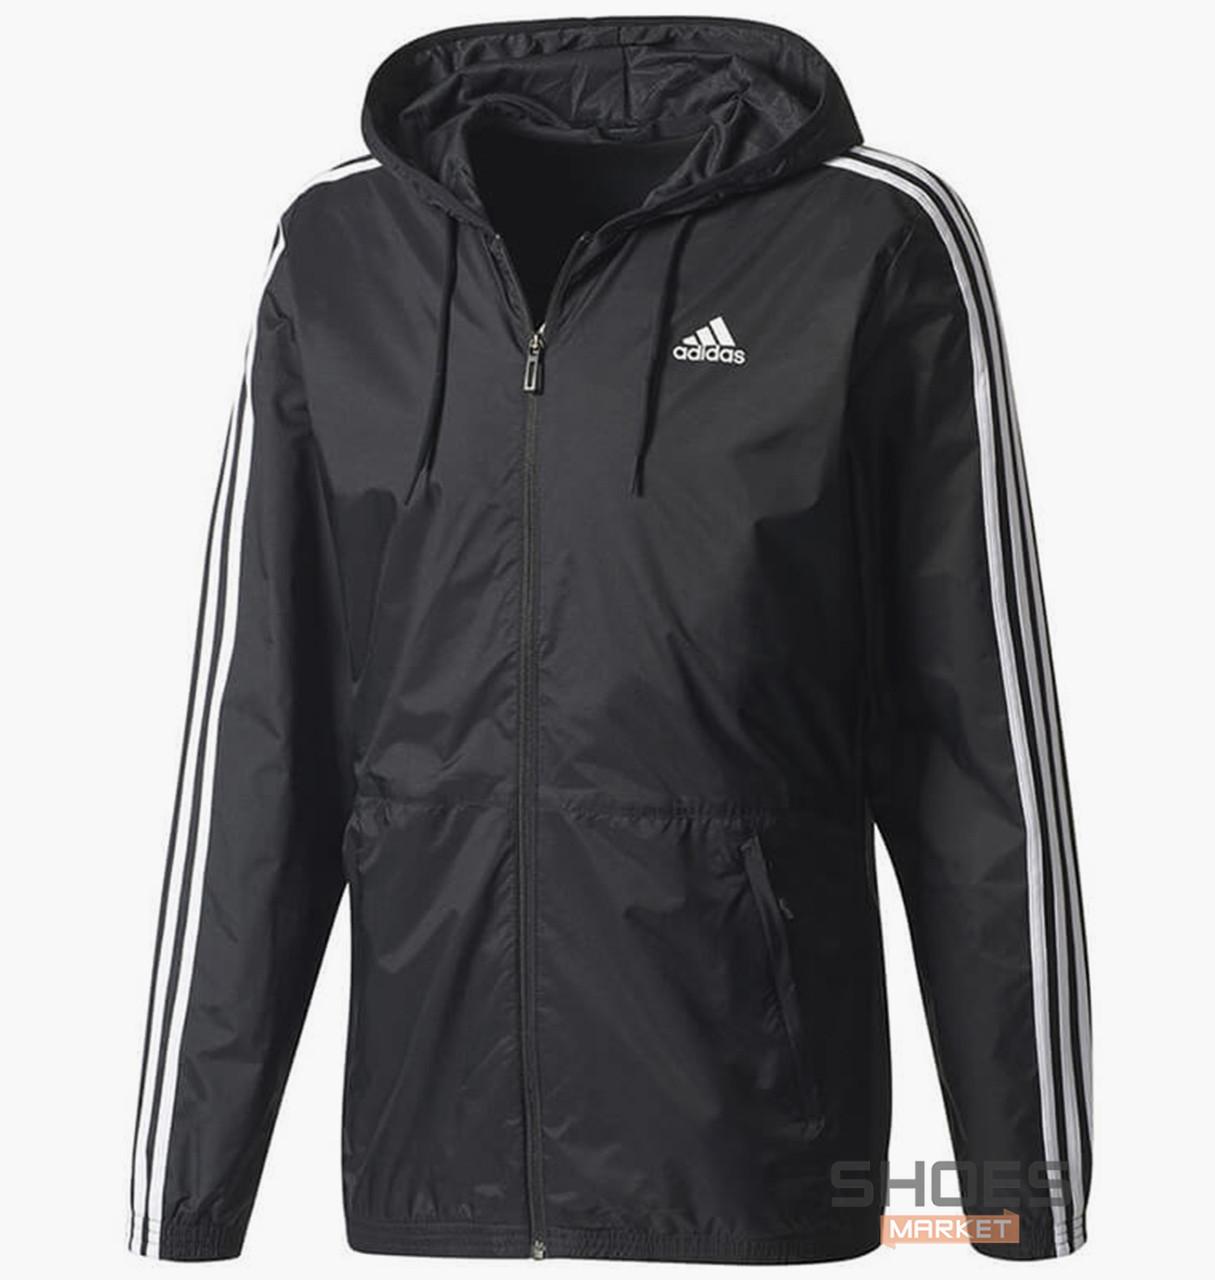 Олимпийка Adidas Black BS2232, оригинал